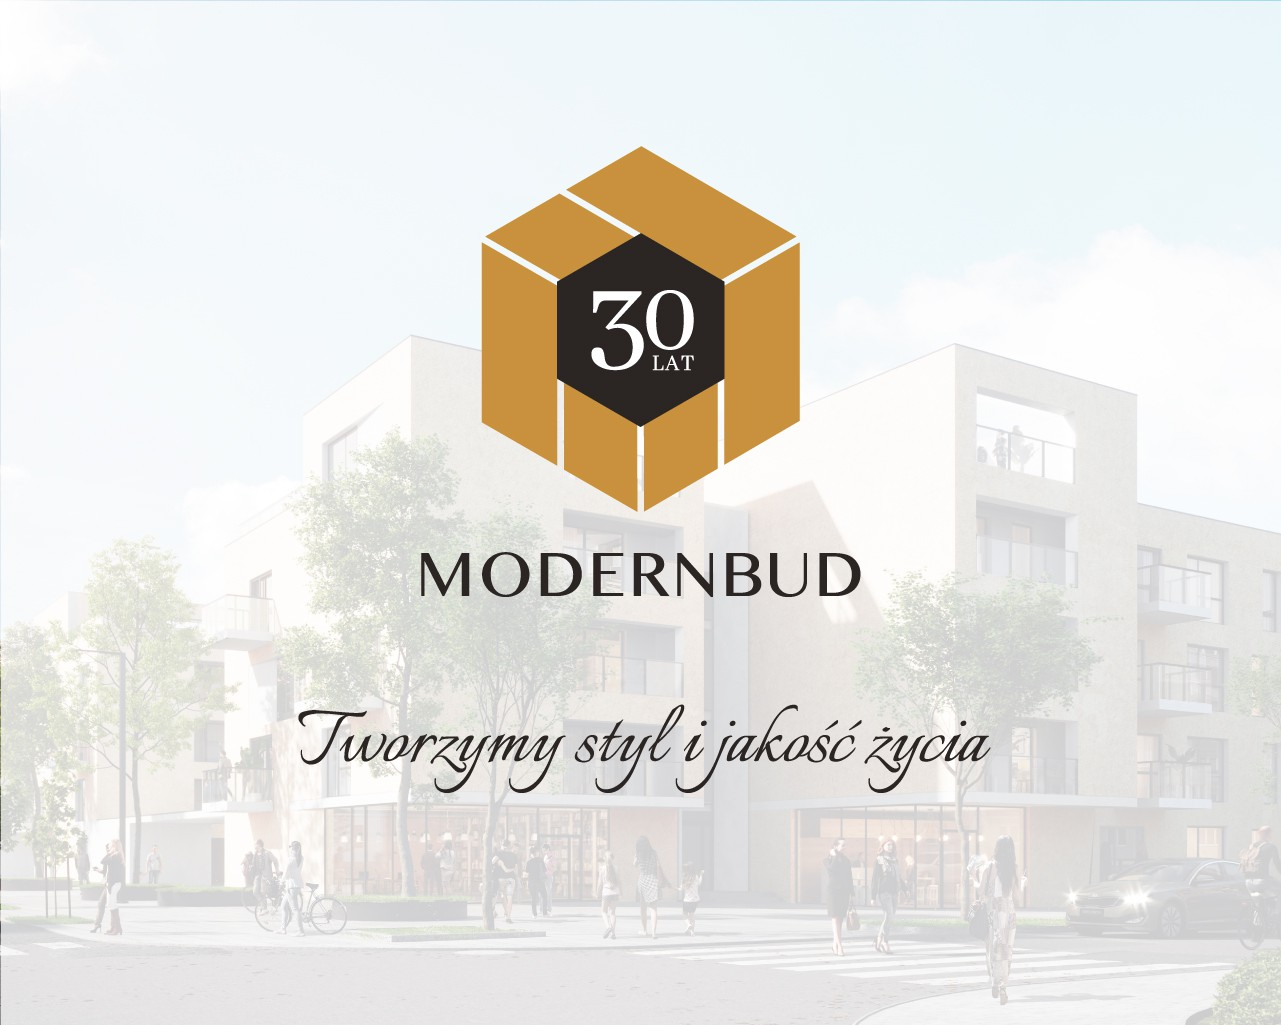 30 lat Modernbud